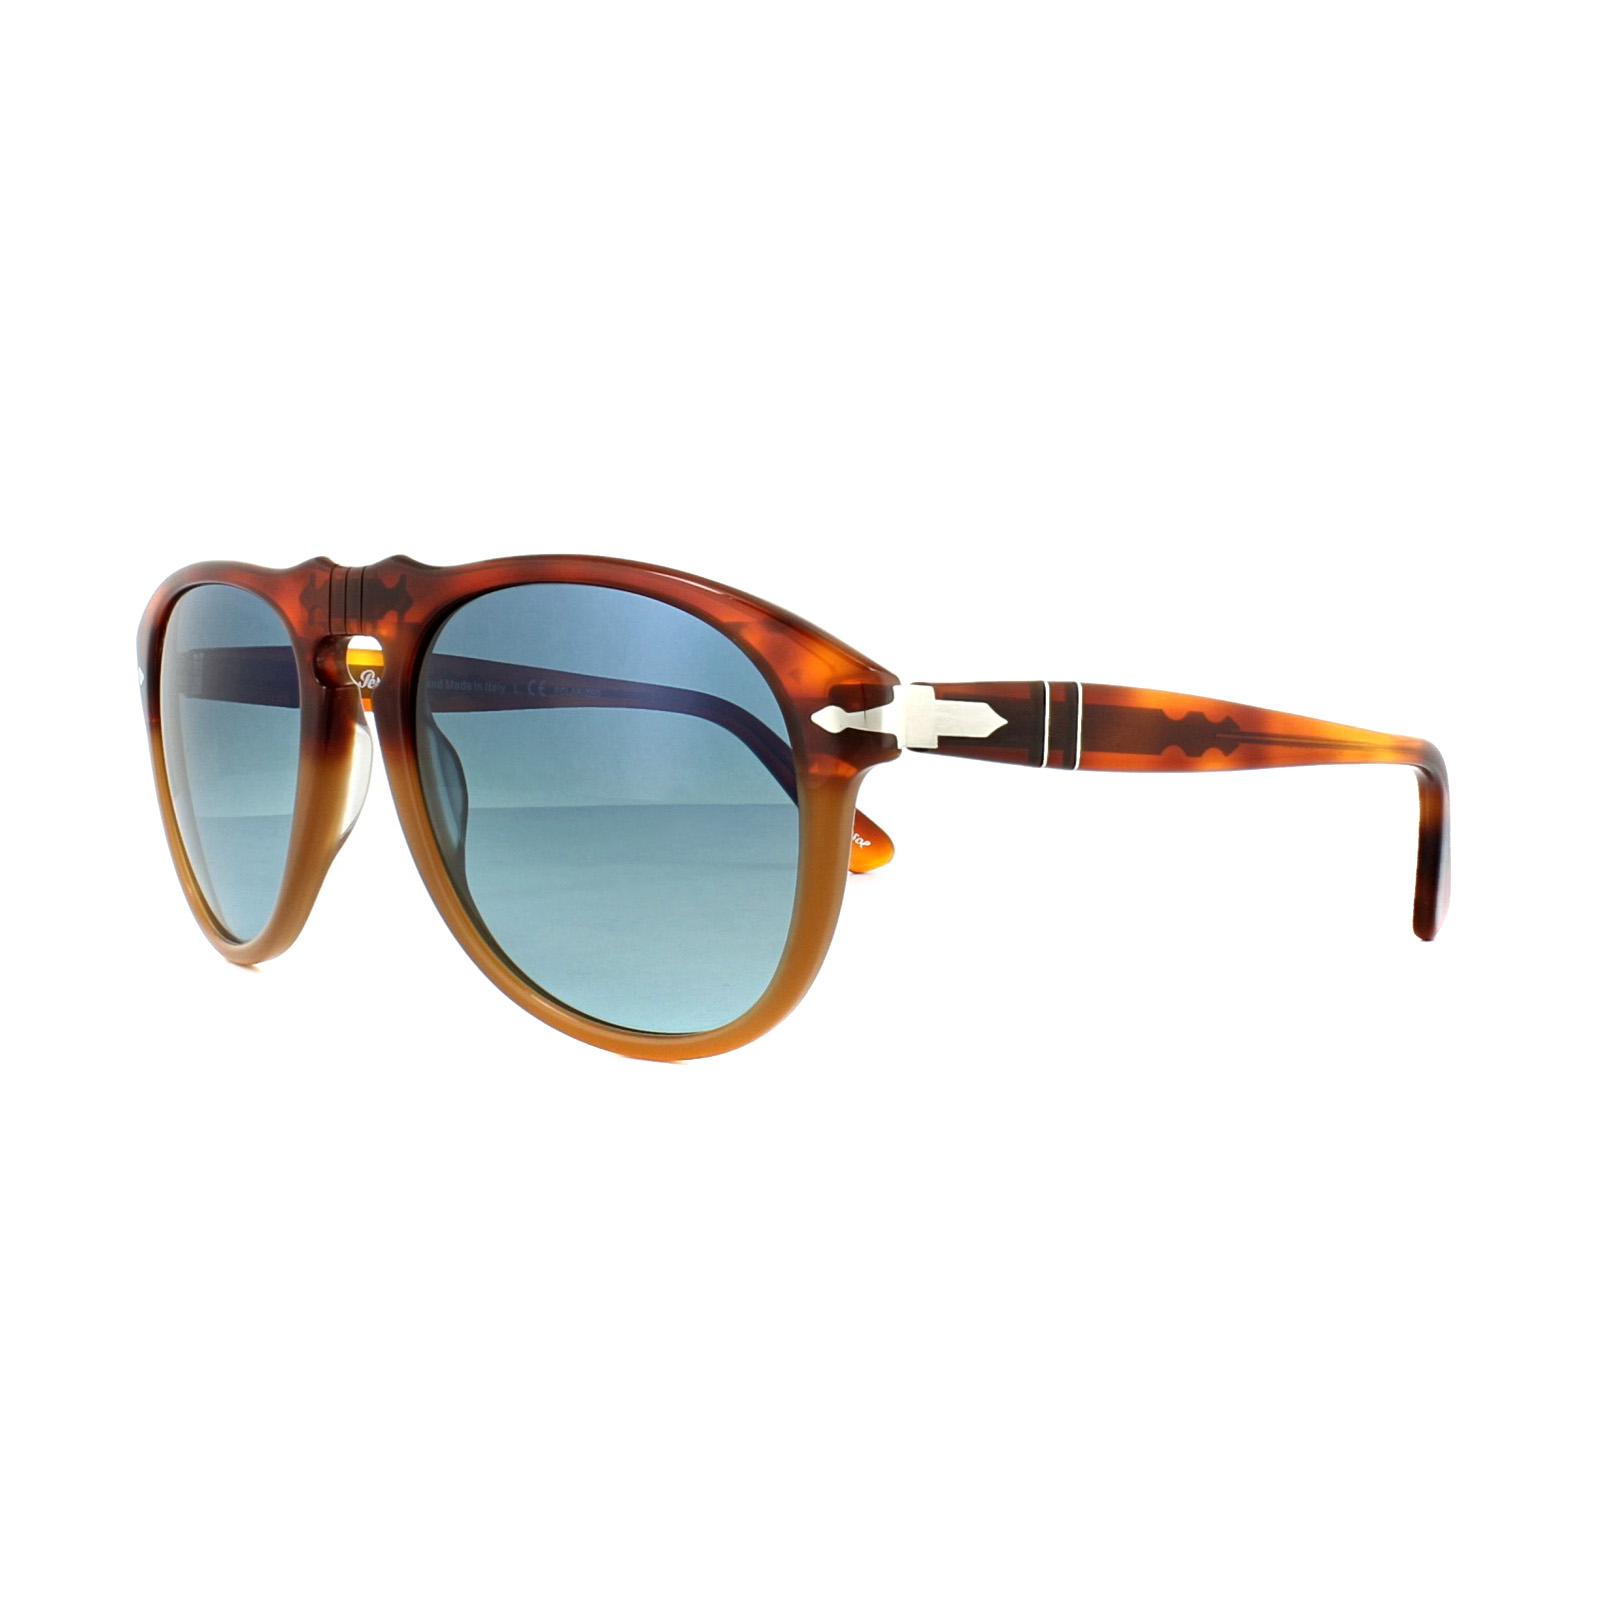 0db4c8945f Sentinel Persol Sunglasses 0649 1025S3 Resina e Sale Brown Blue Polarized  54mm